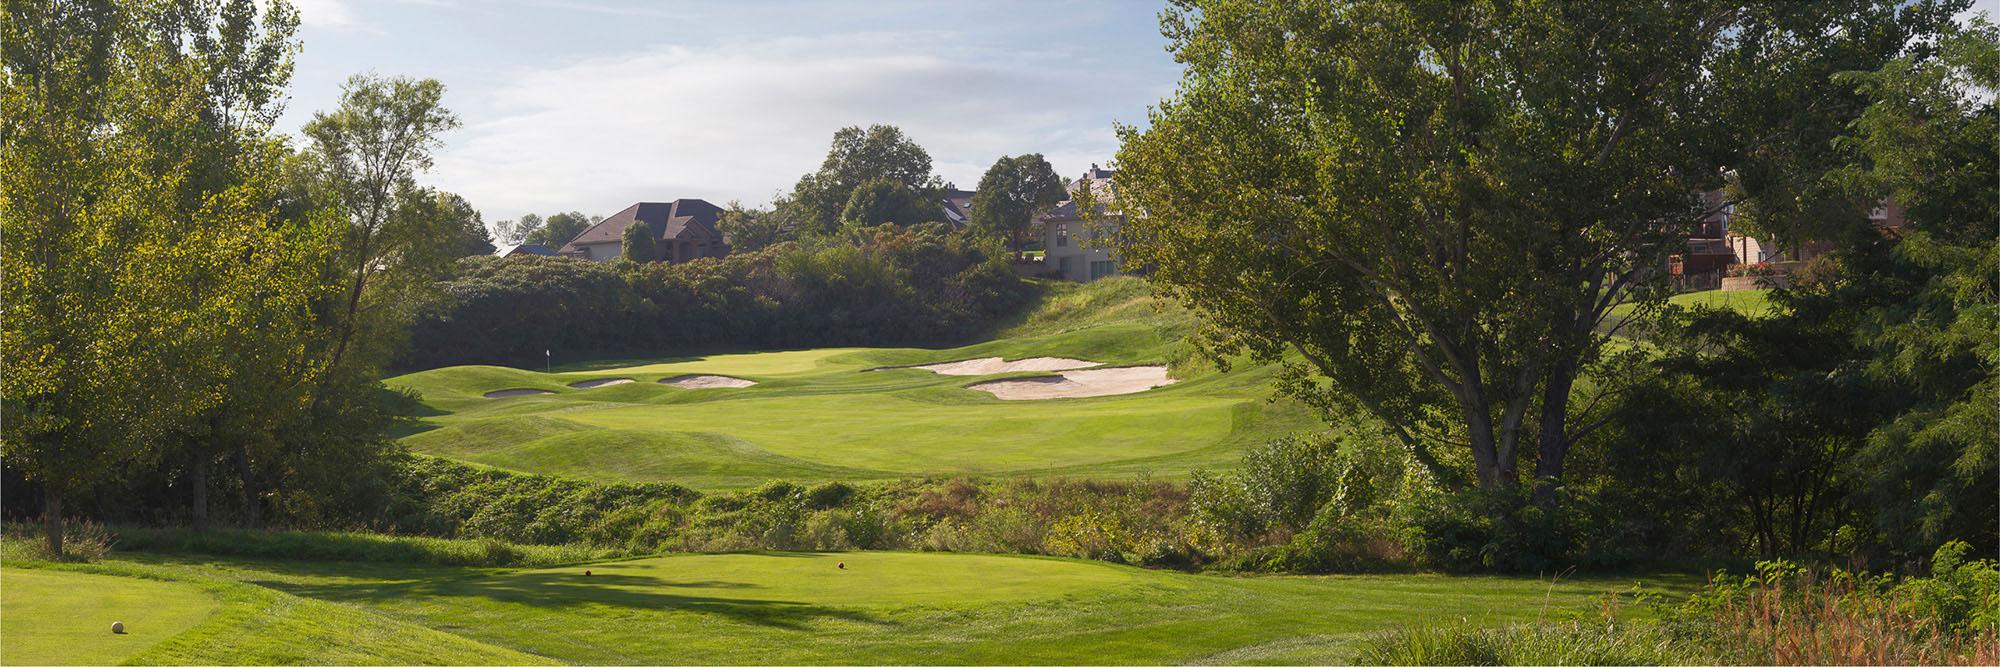 Golf Course Image - Champions Run No. 4